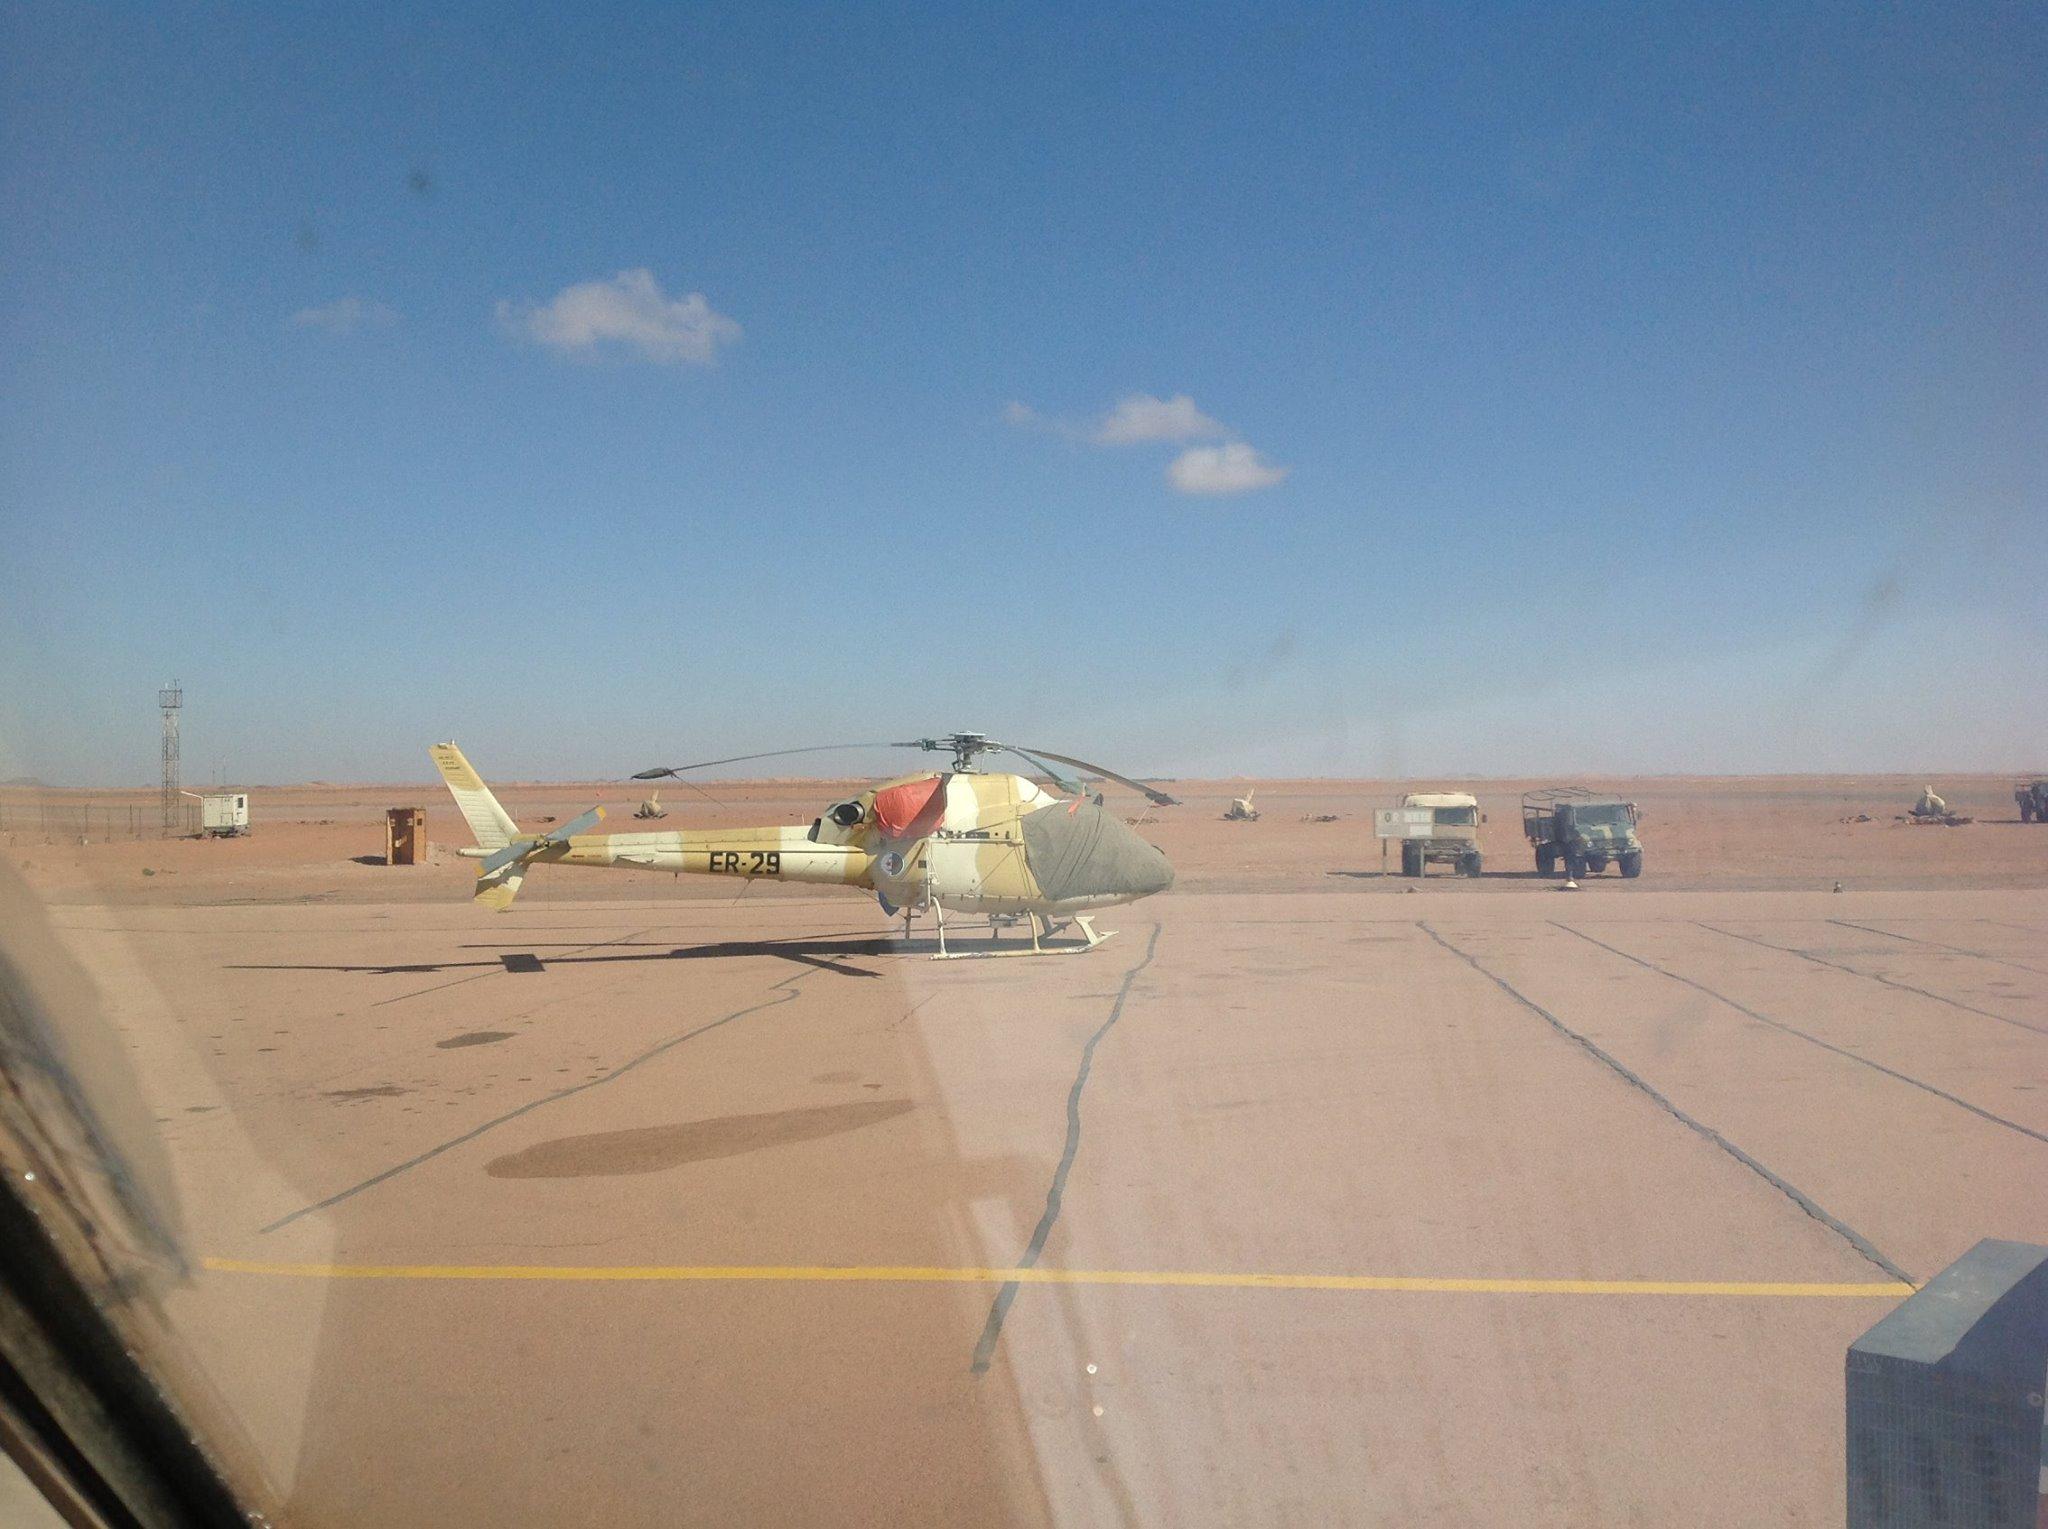 صور مروحيات القوات الجوية الجزائرية Ecureuil/Fennec ] AS-355N2 / AS-555N ] - صفحة 3 25567344994_066bef33ea_o